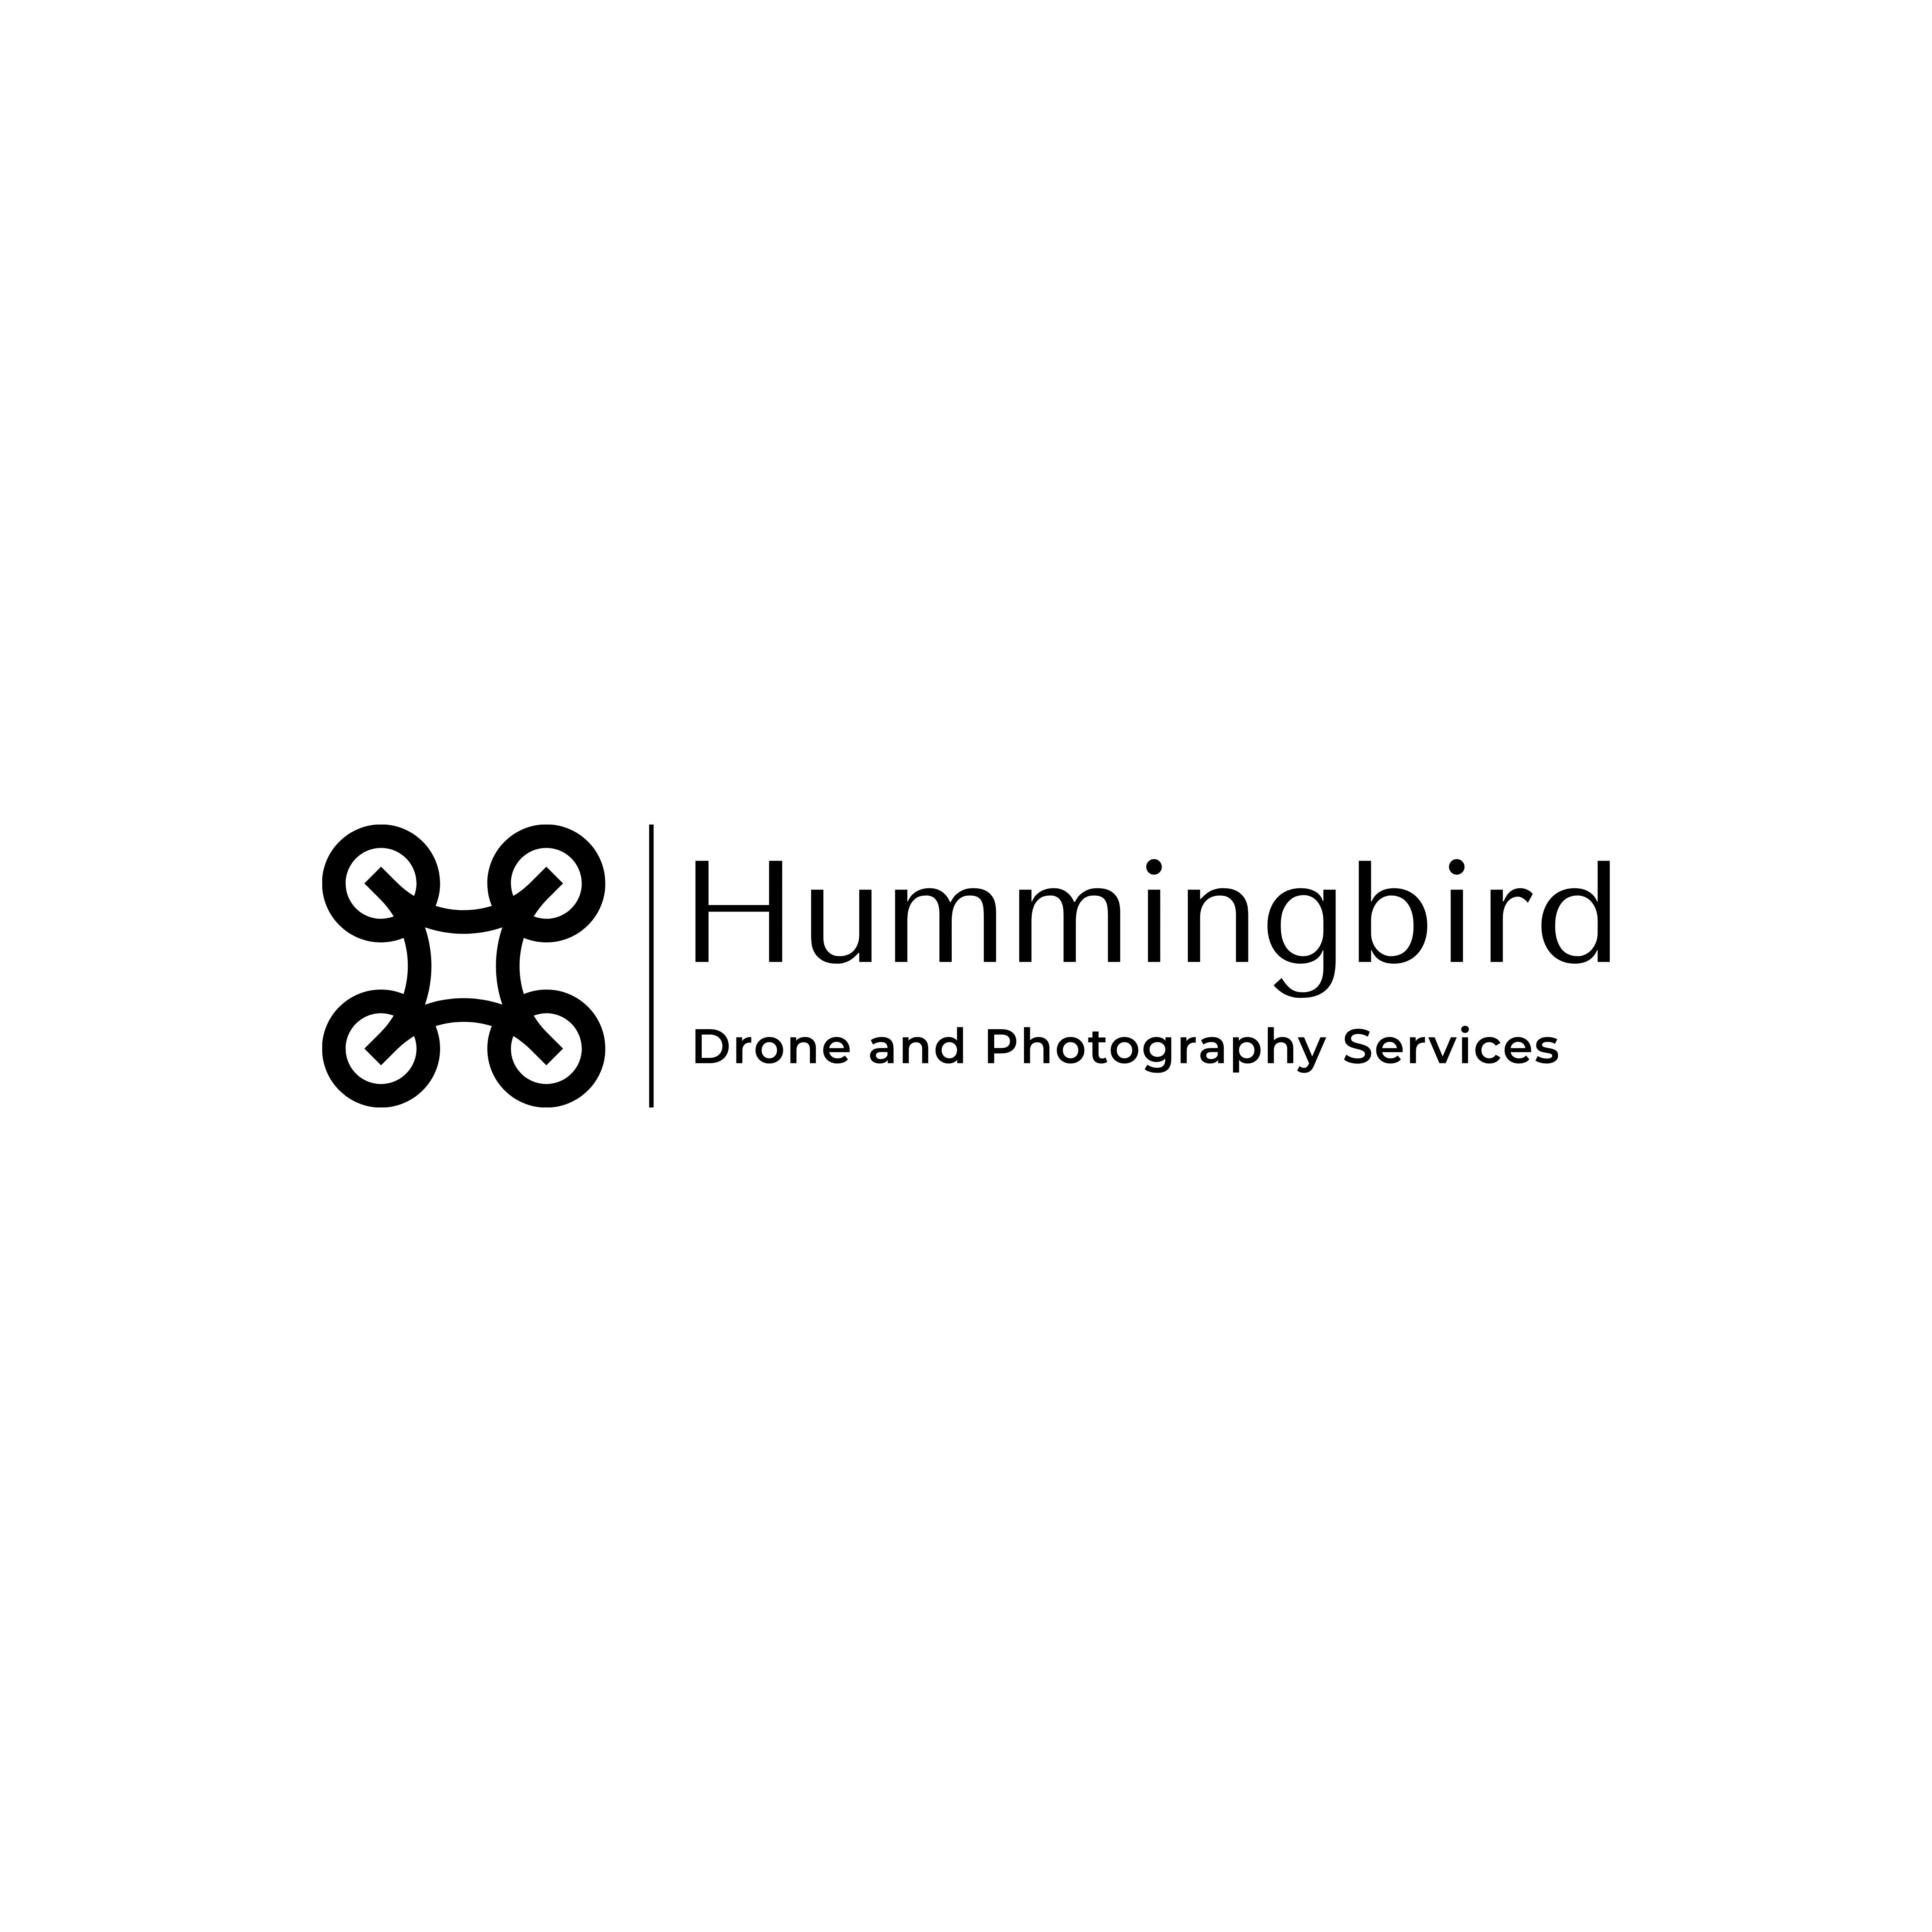 Hummingbird Drone Services